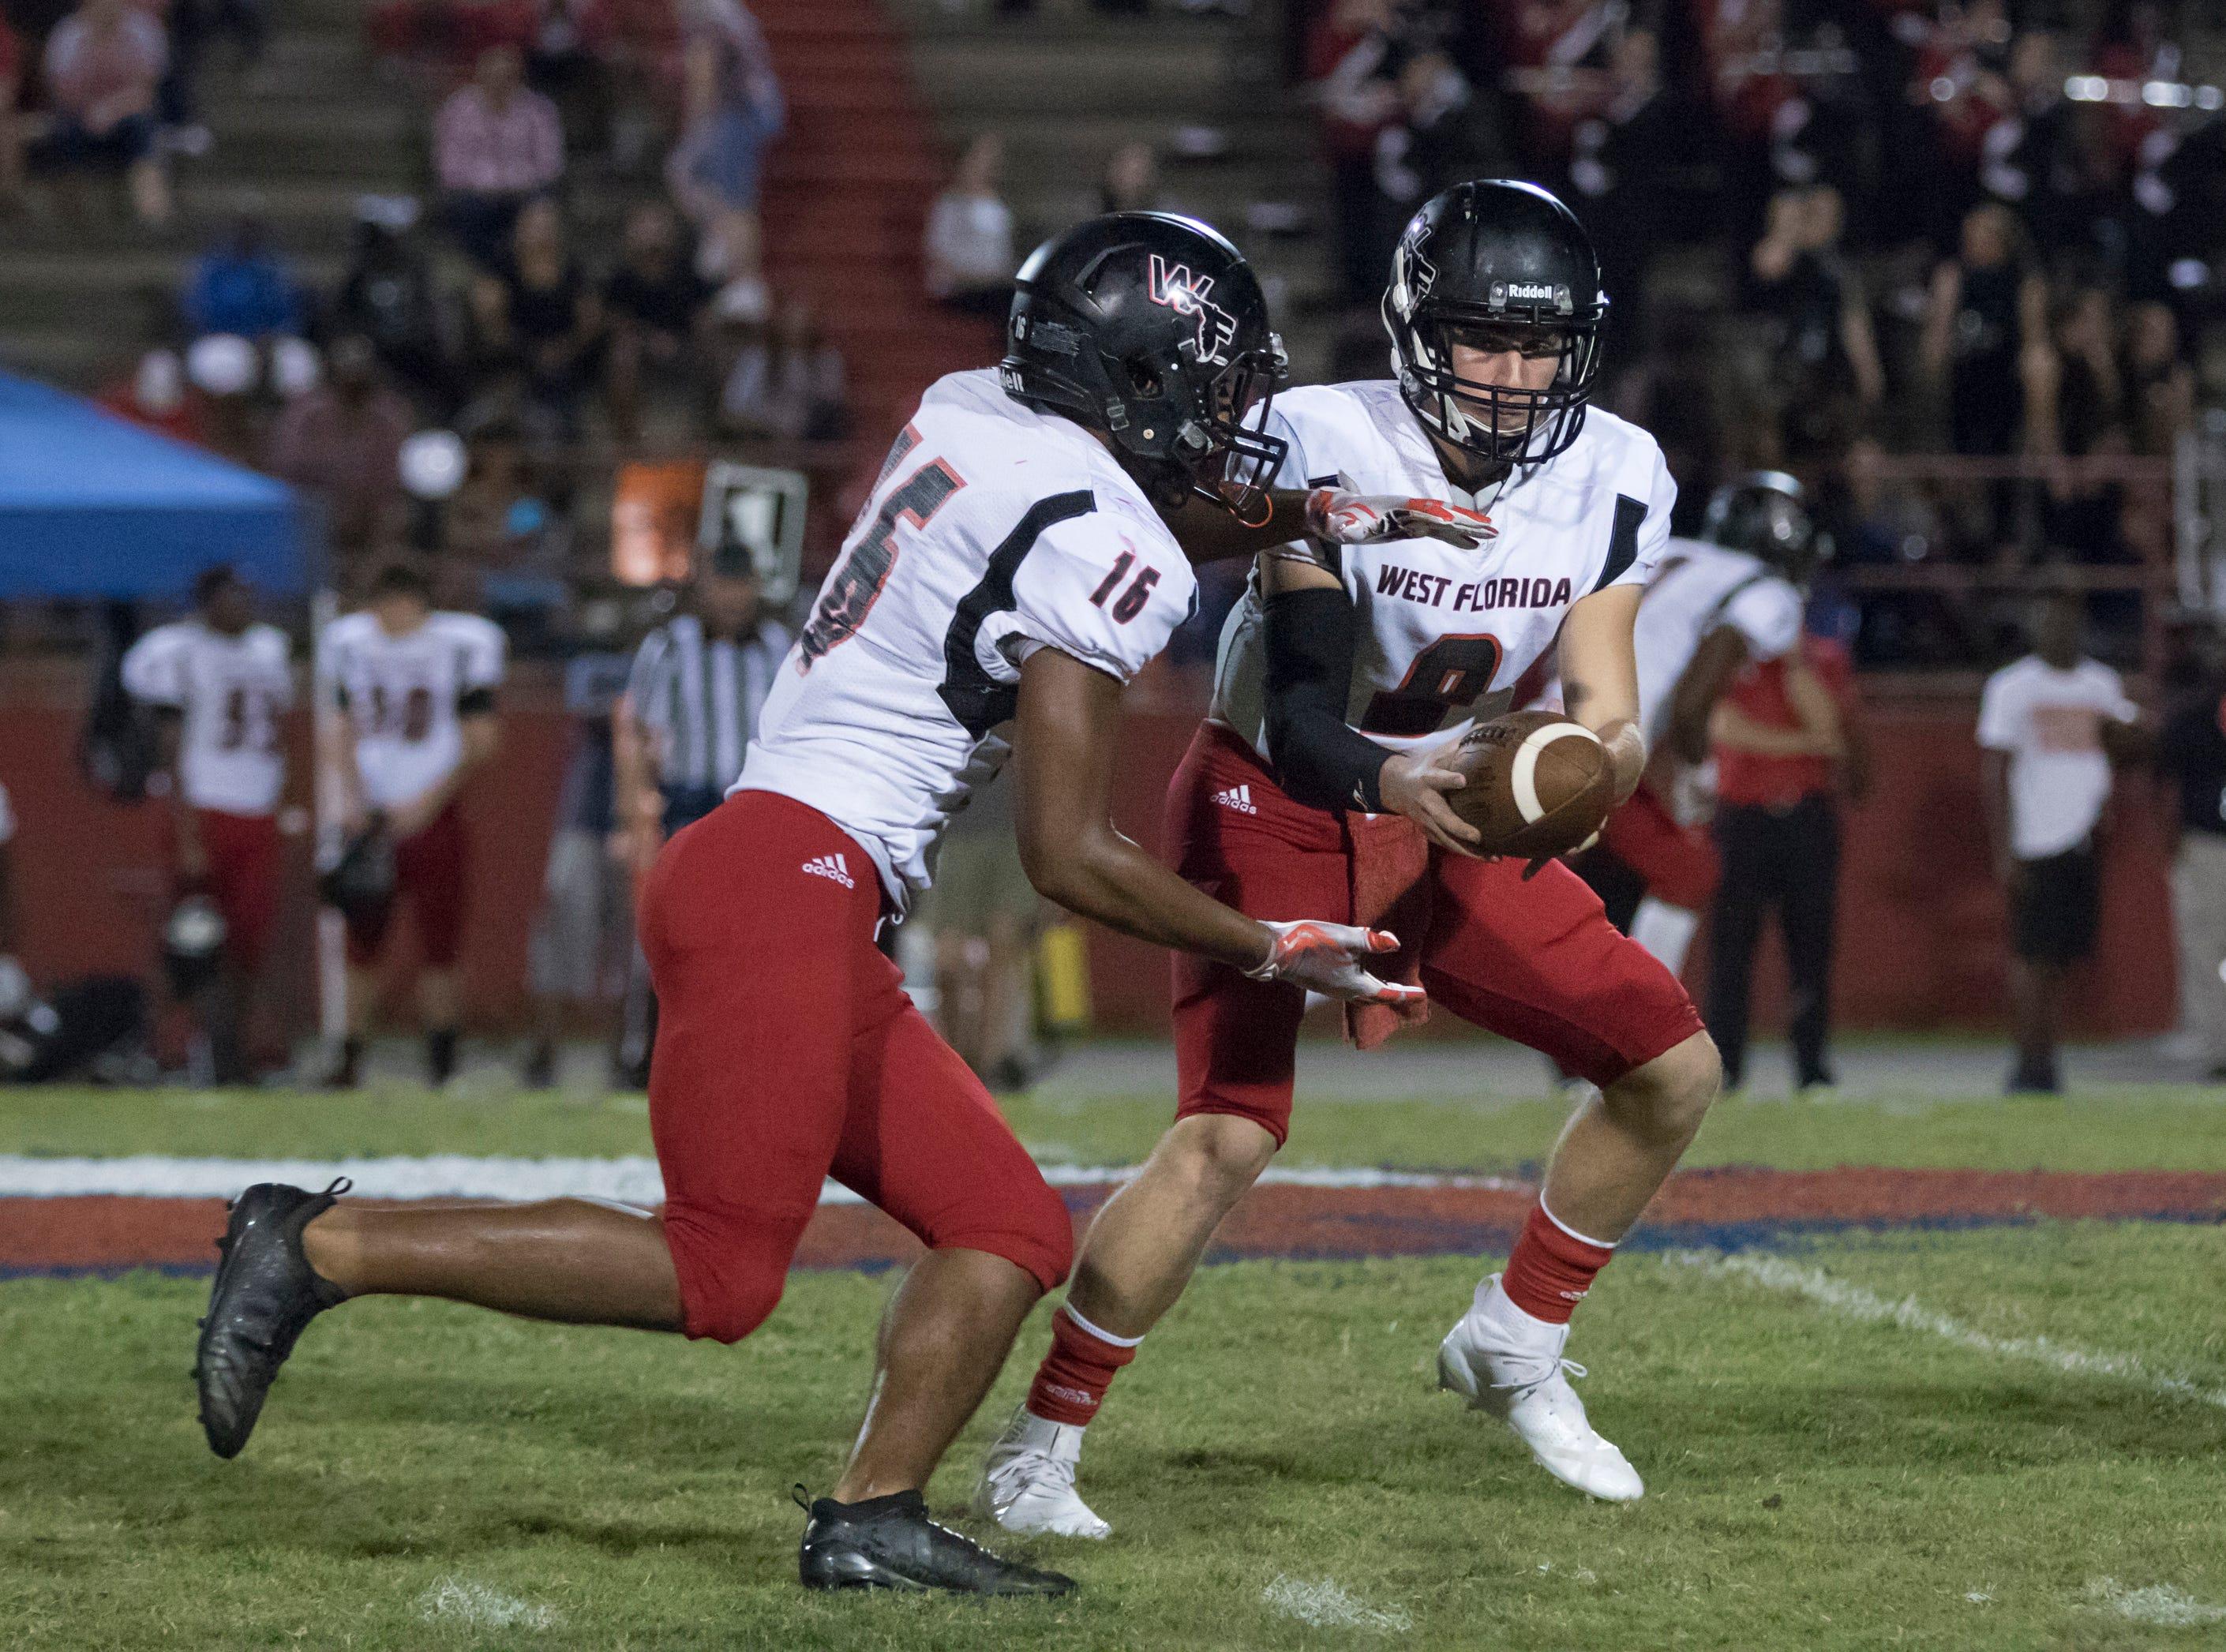 Quarterback Trevor Jordan (9) hands off to Elijah Edmonds (16) during the West Florida vs Pine Forest football game at Pine Forest High School in Pensacola on Friday, October 5, 2018.